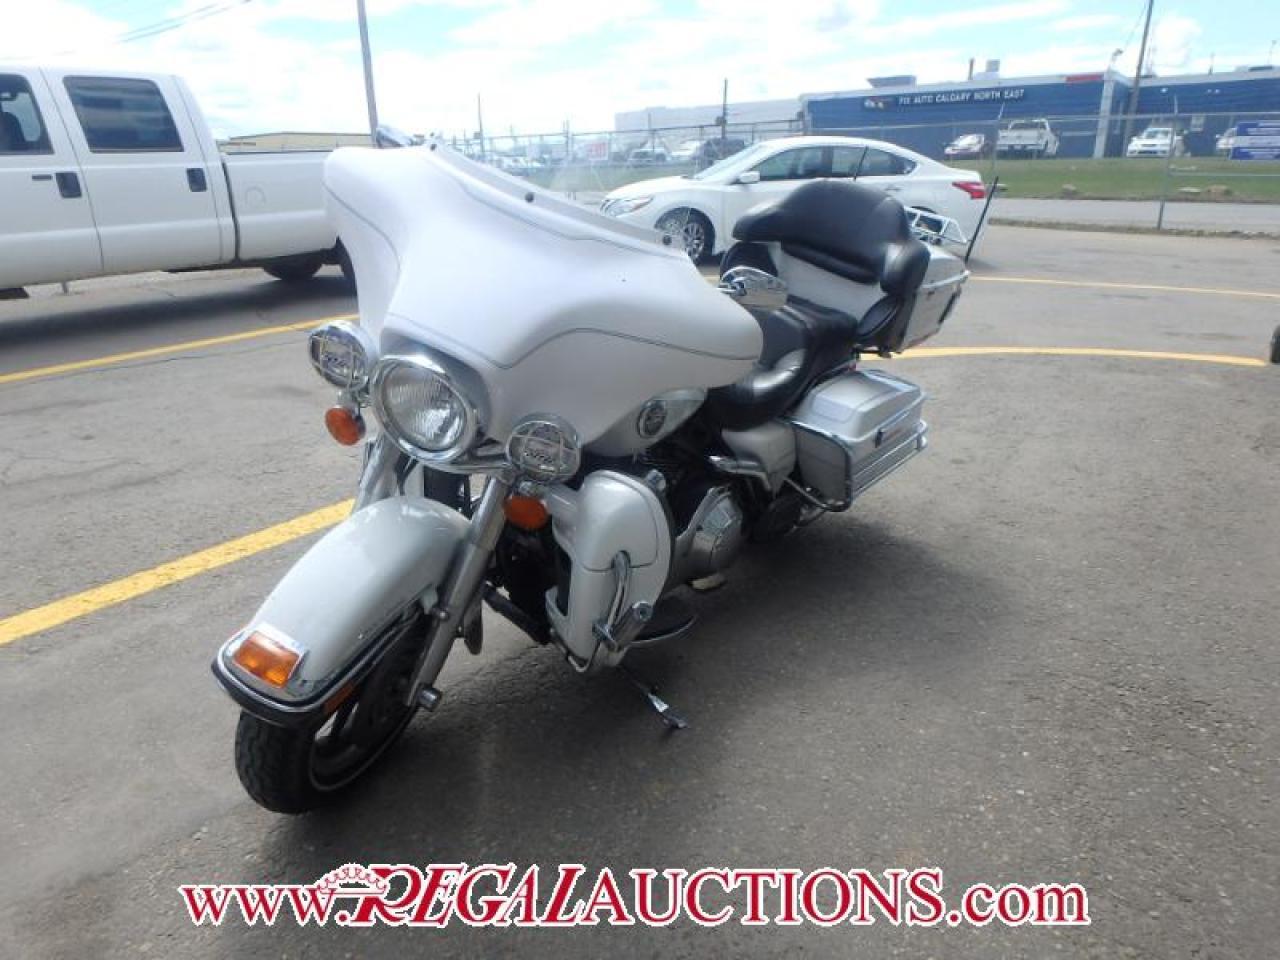 2007 HARLEY DAVISDSON ULTRA CLASSIC ELECTROGLIDE TOURING MOTORCYCLE